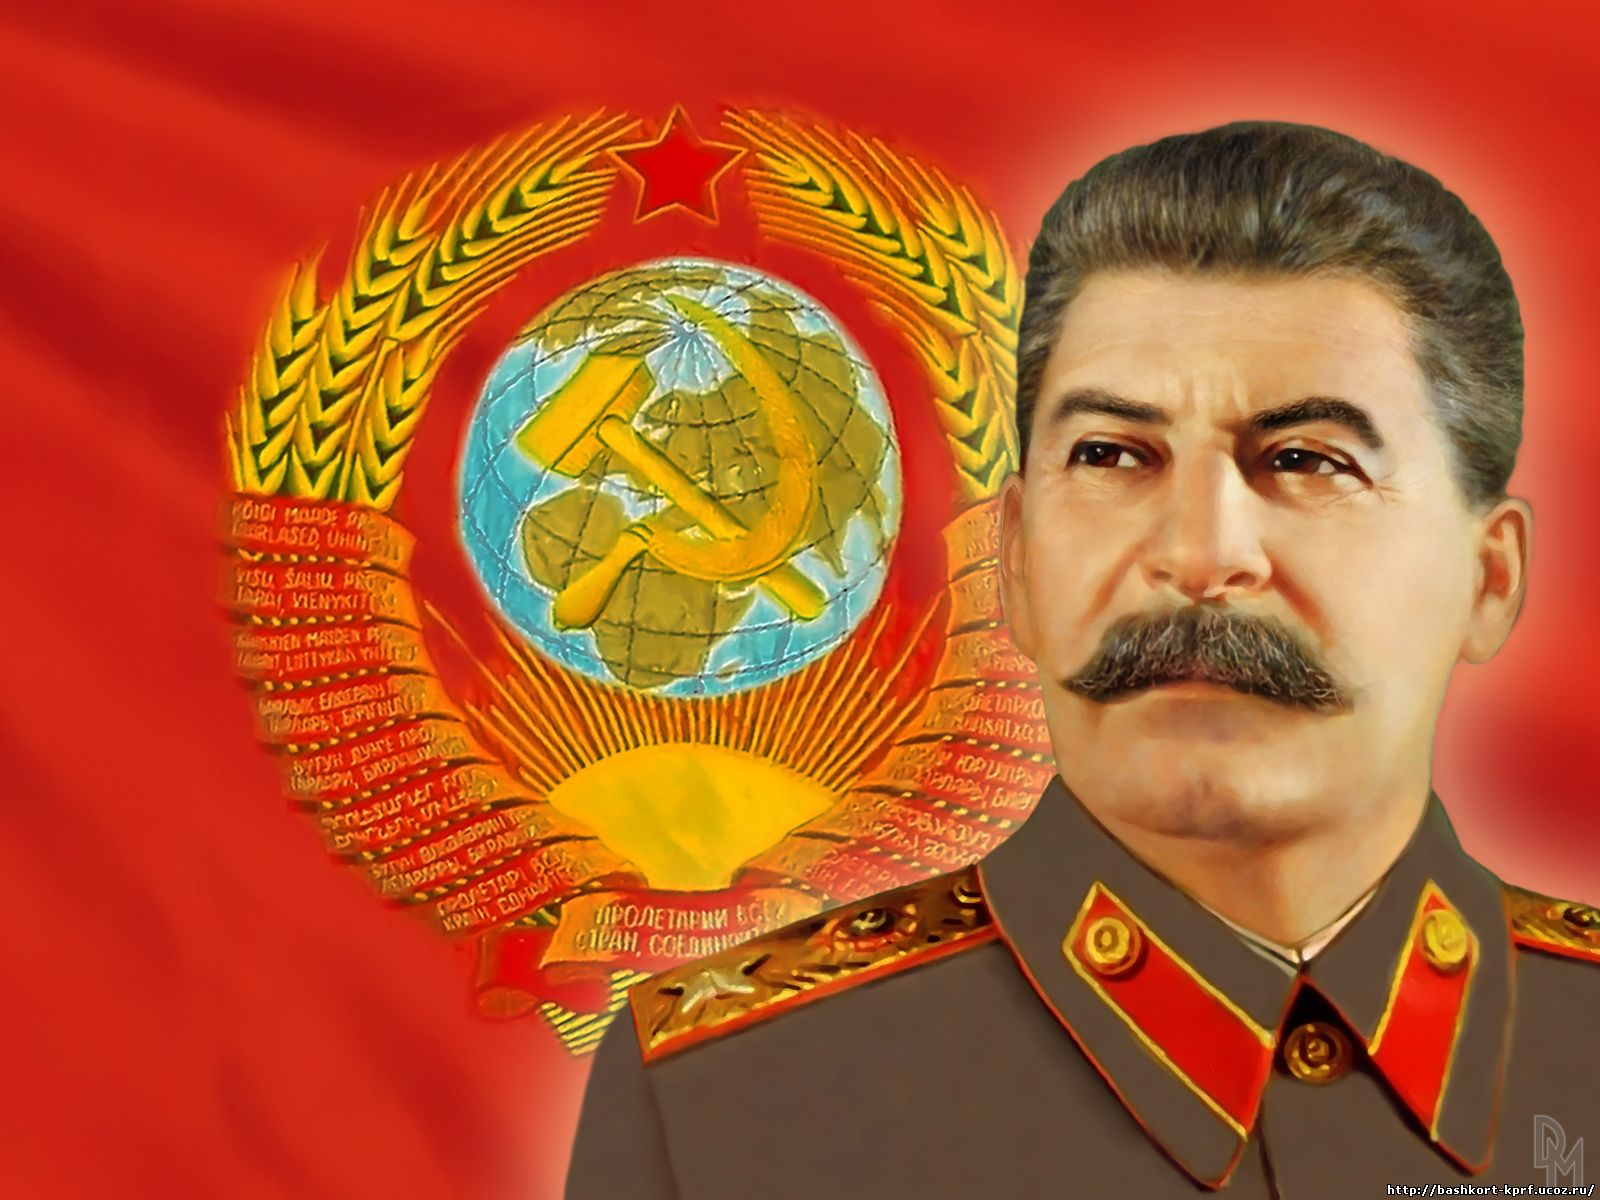 http://1.bp.blogspot.com/-c2dYU6JispY/UGnZsJIJwXI/AAAAAAAACBE/6pRqbAFMZ4g/s1600/stalin_wallpaper.jpeg